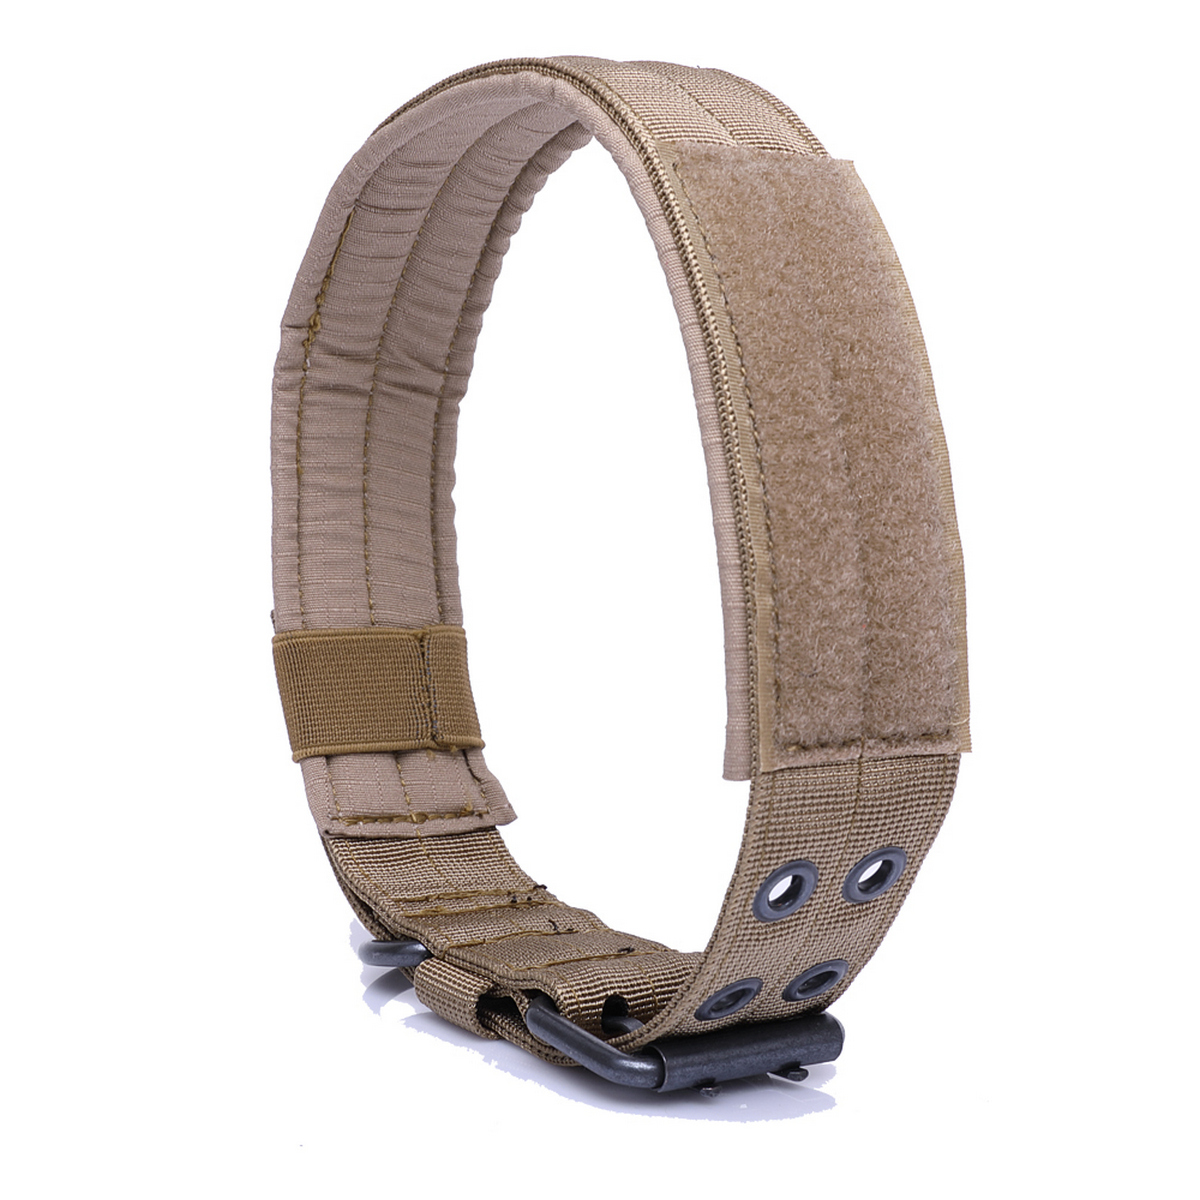 Tactical-Scorpion-Gear-Dog-Collar-Canine-K9-Training-Walking-Military-Nylon thumbnail 14